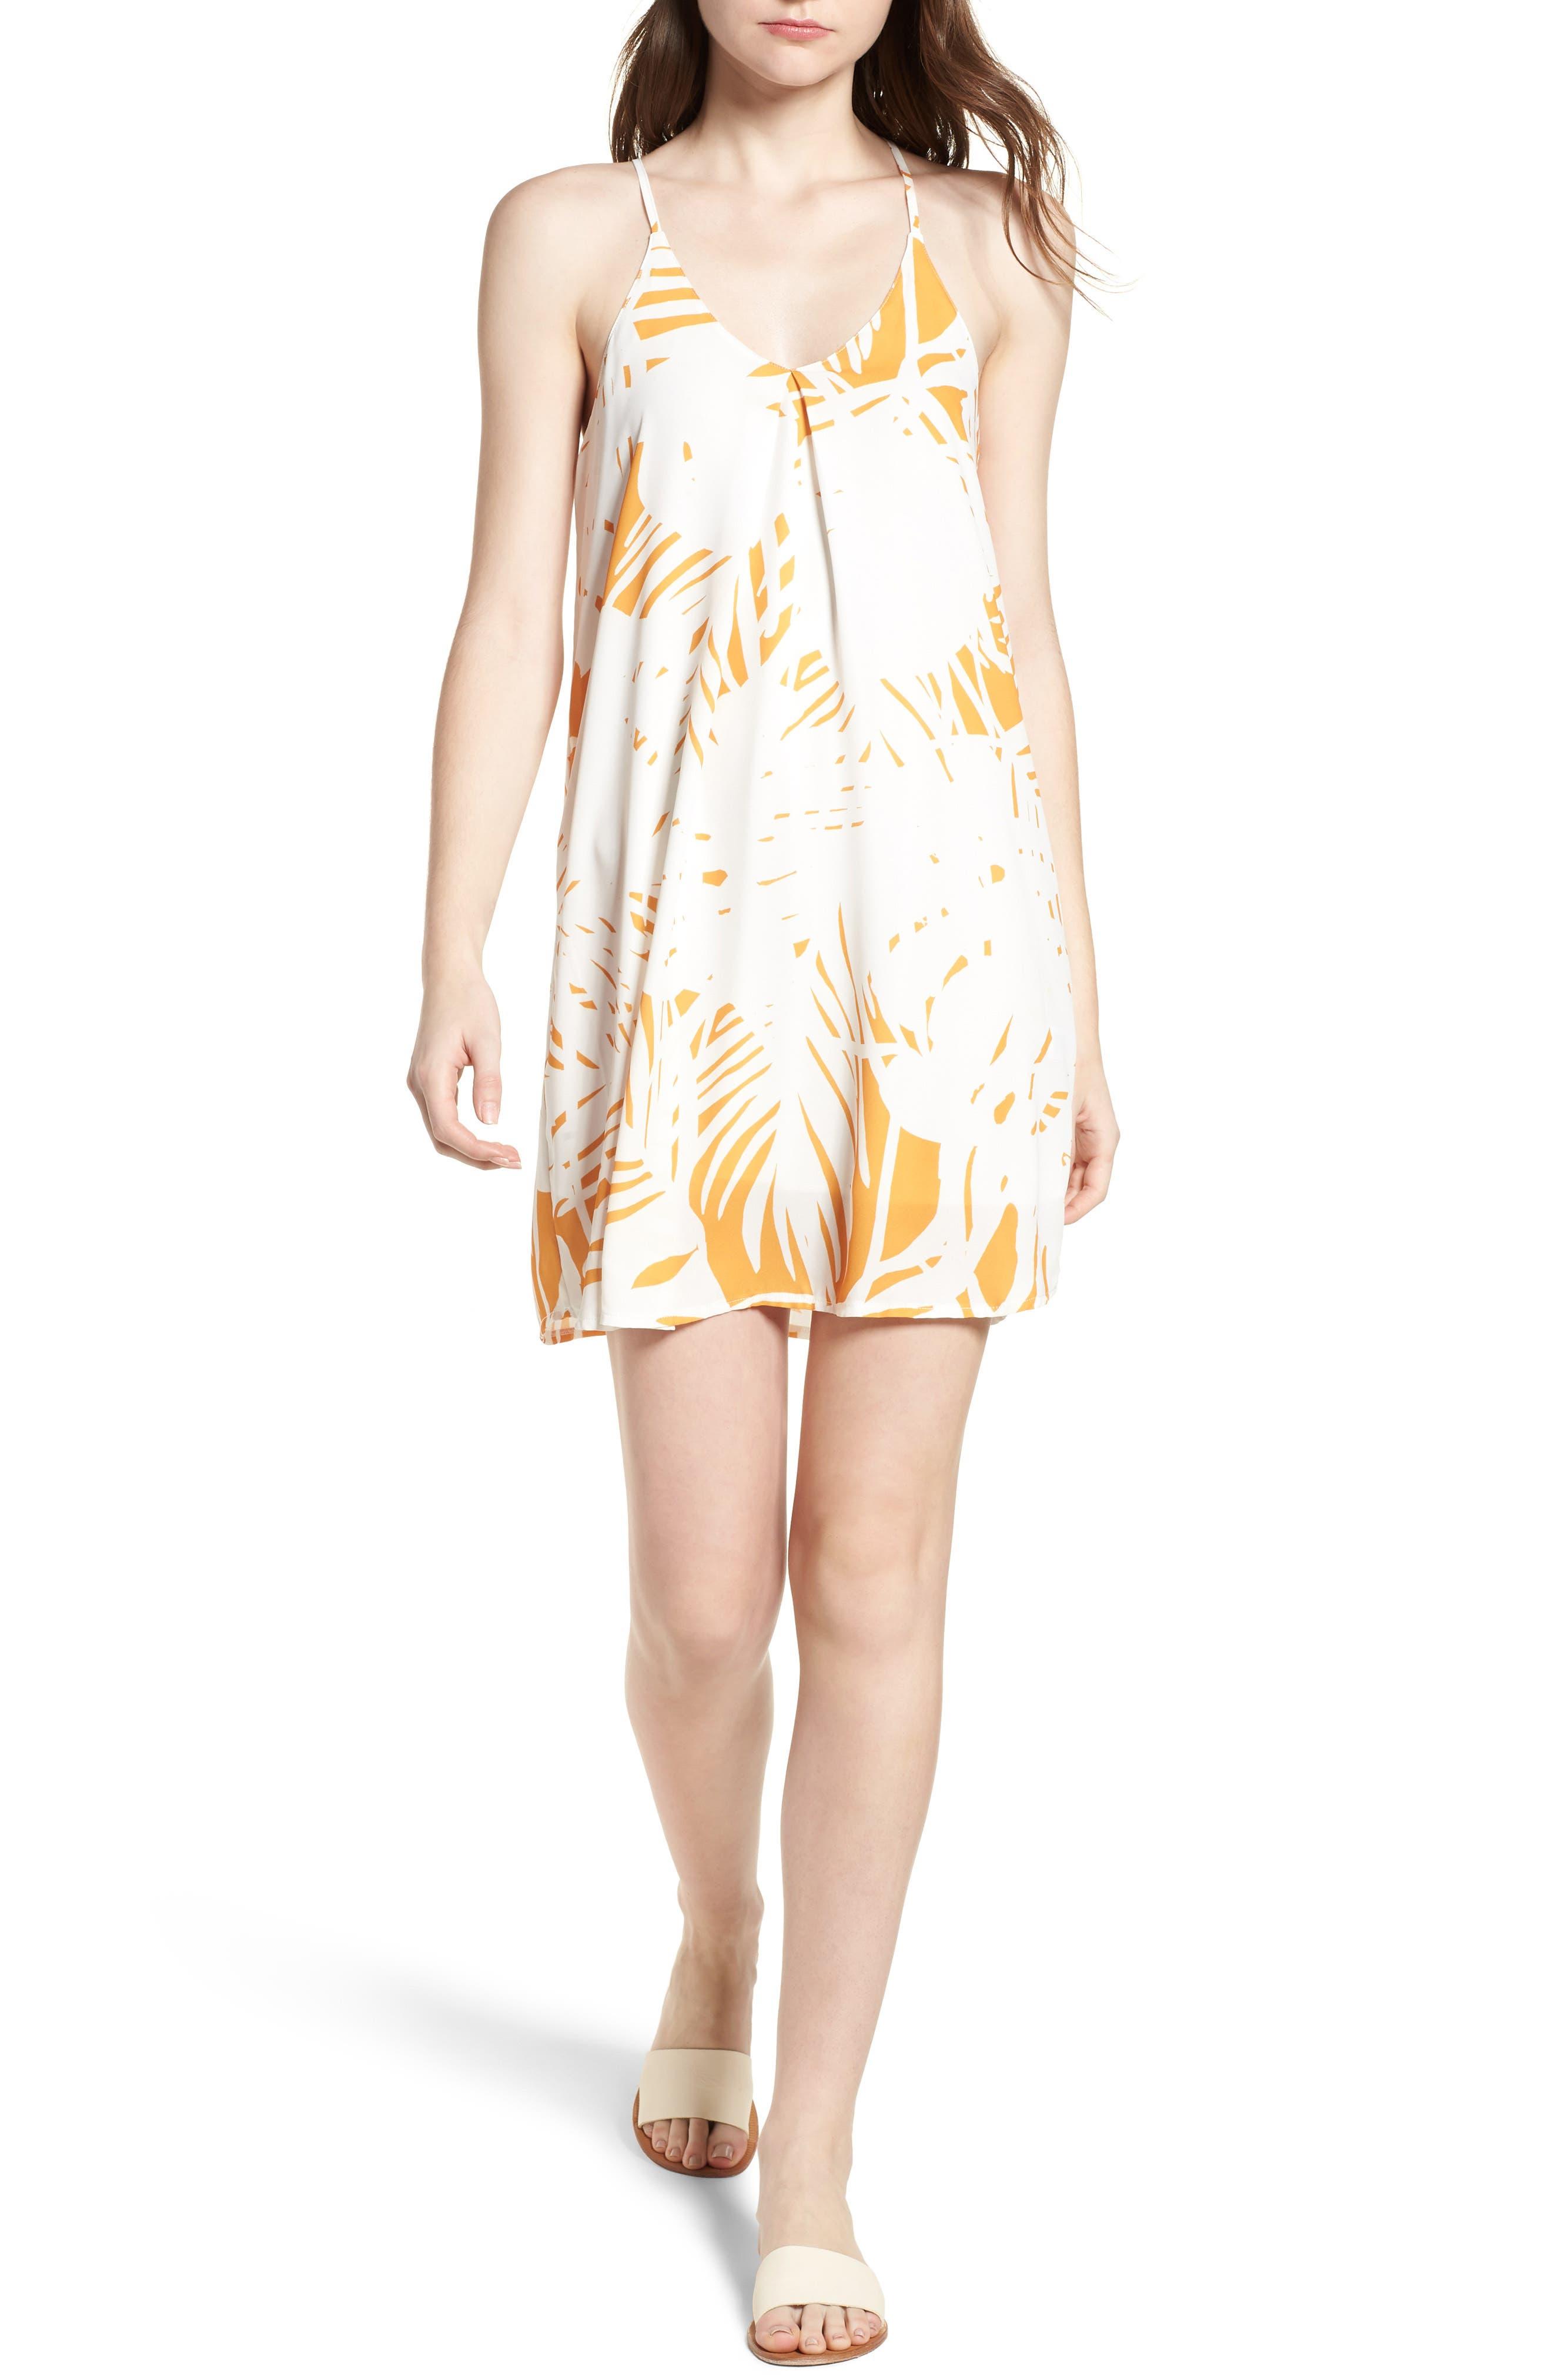 Bishop + Young Print Racerback Dress,                         Main,                         color, 742